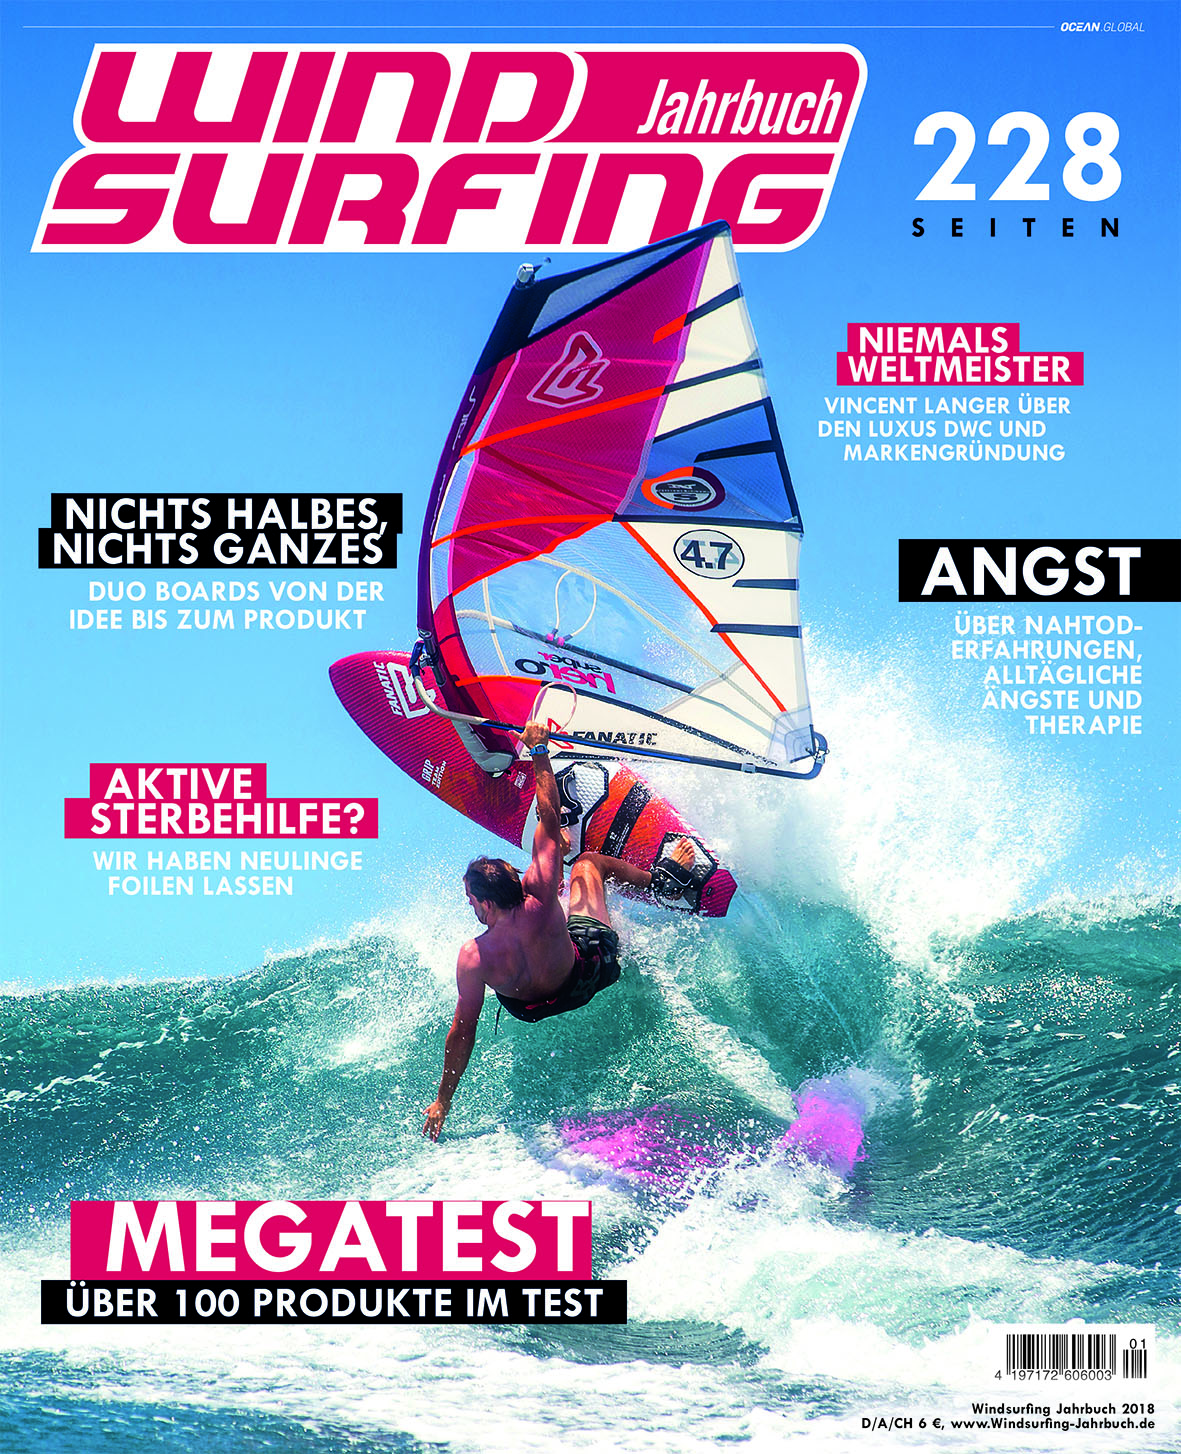 Windsurfing Jahrbuch 2017 / 2018 : Ocean.Global